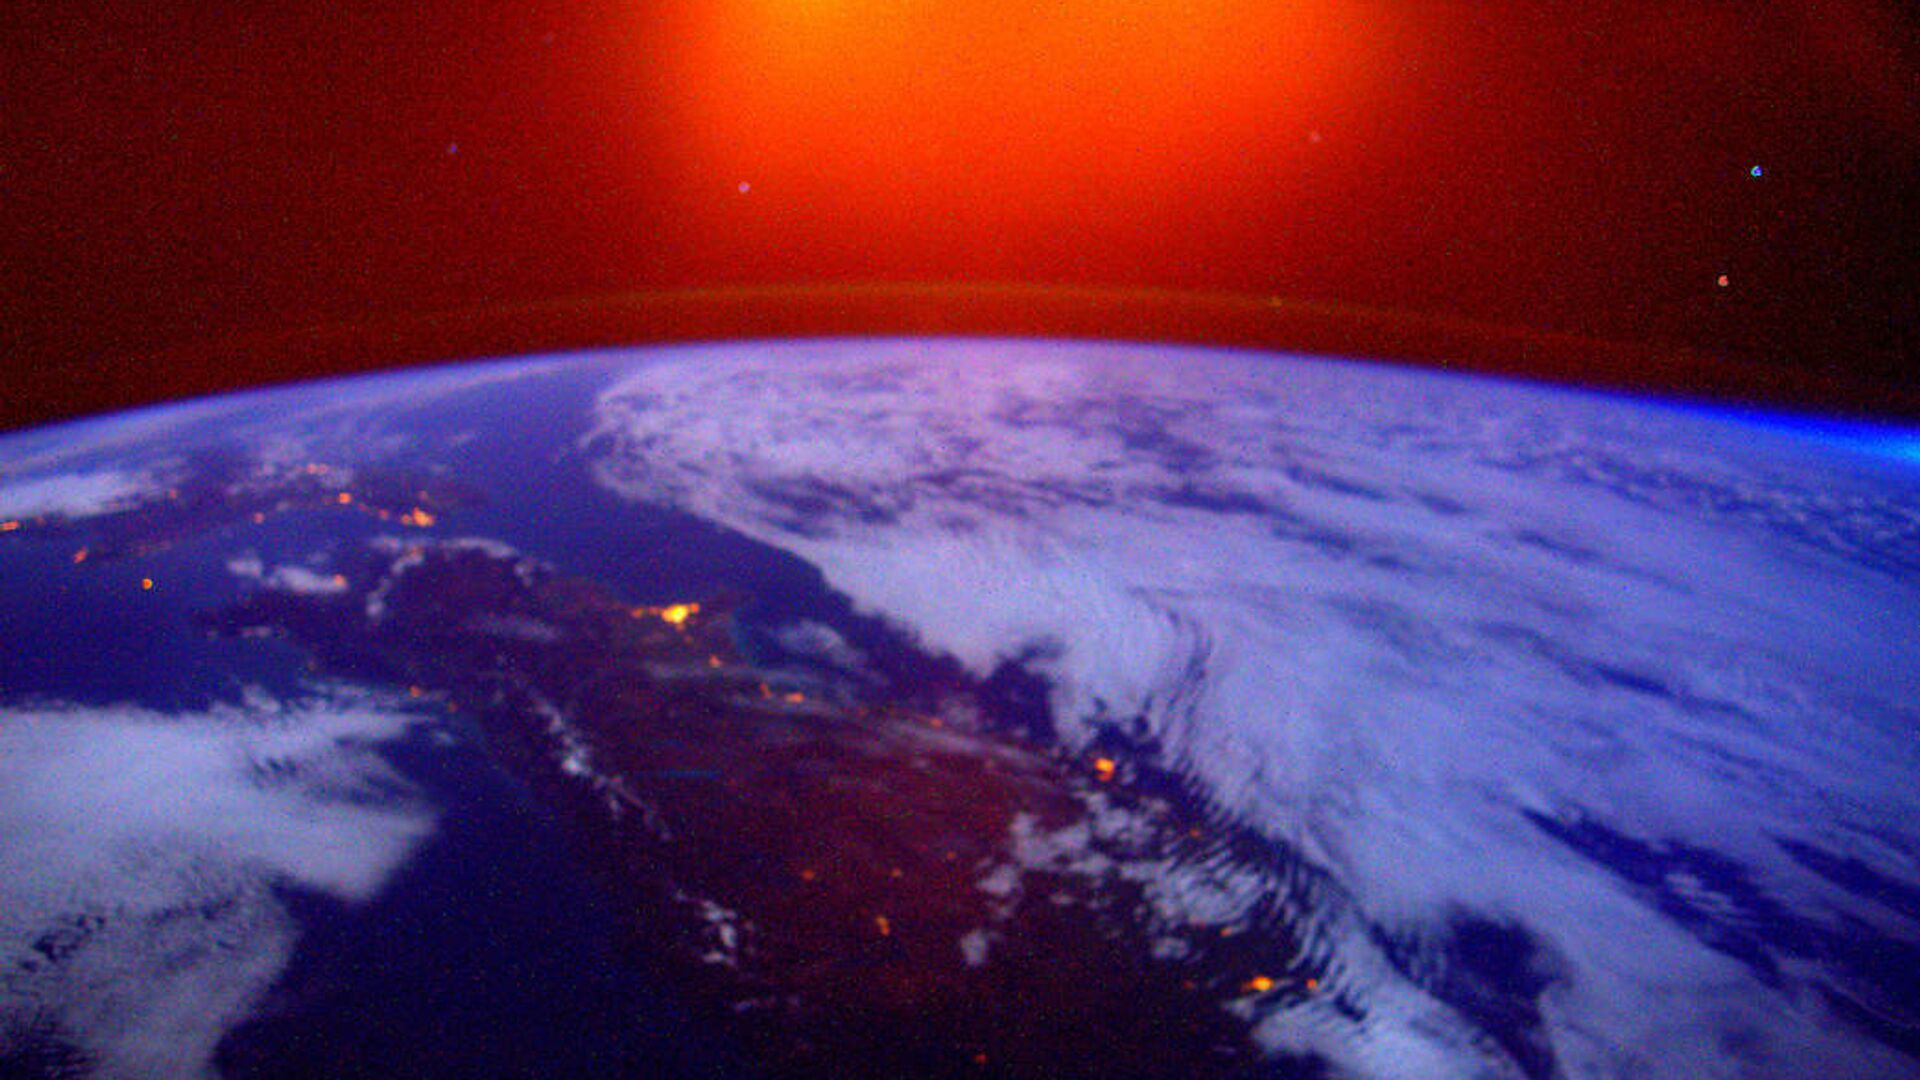 Una foto della Terra presa dall'ISS - Sputnik Italia, 1920, 28.03.2021